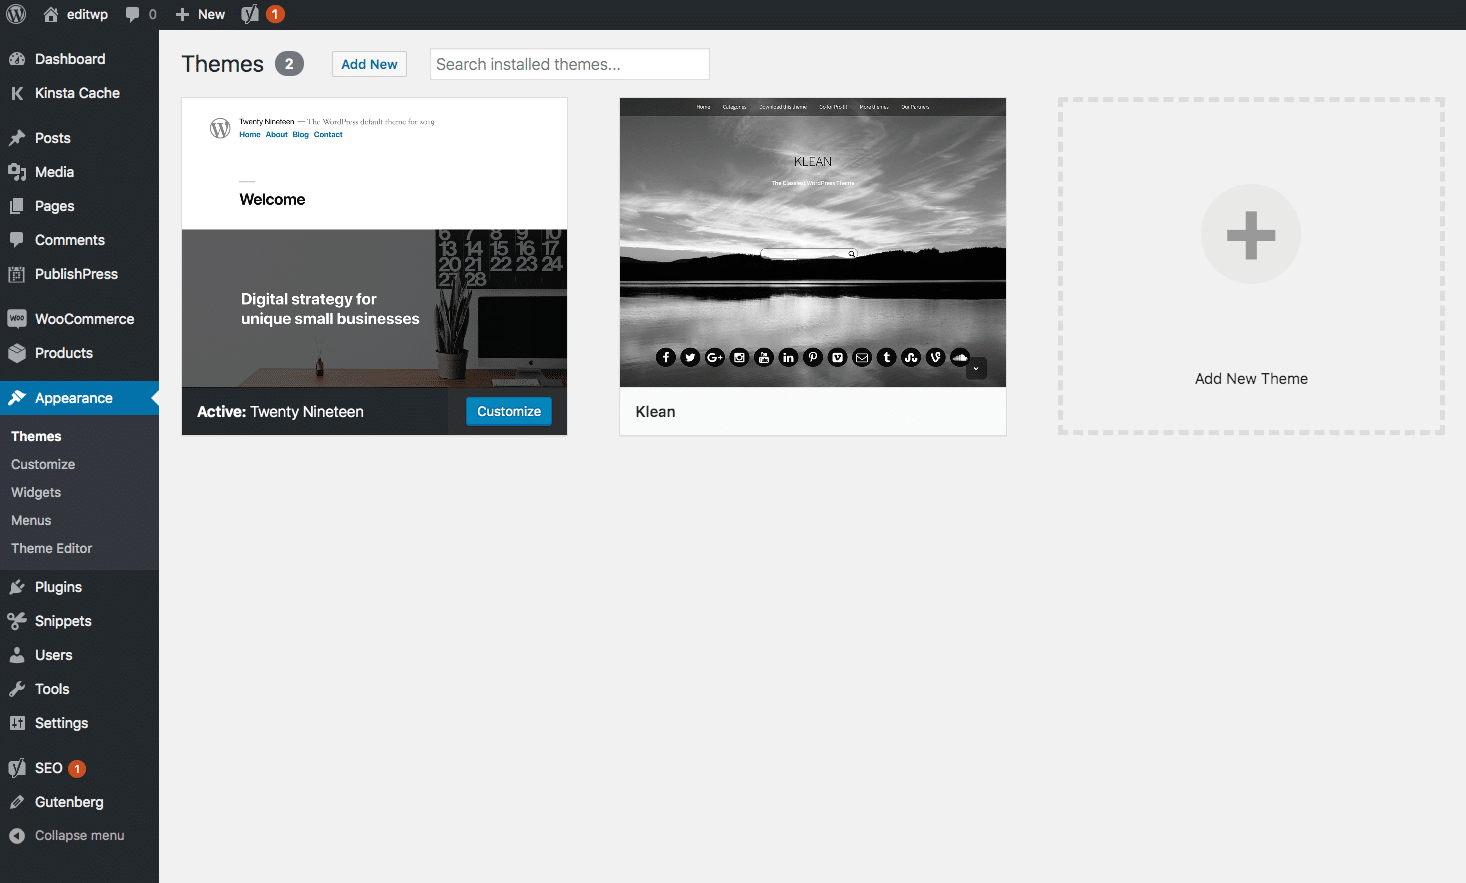 Nuværende tema i WordPress